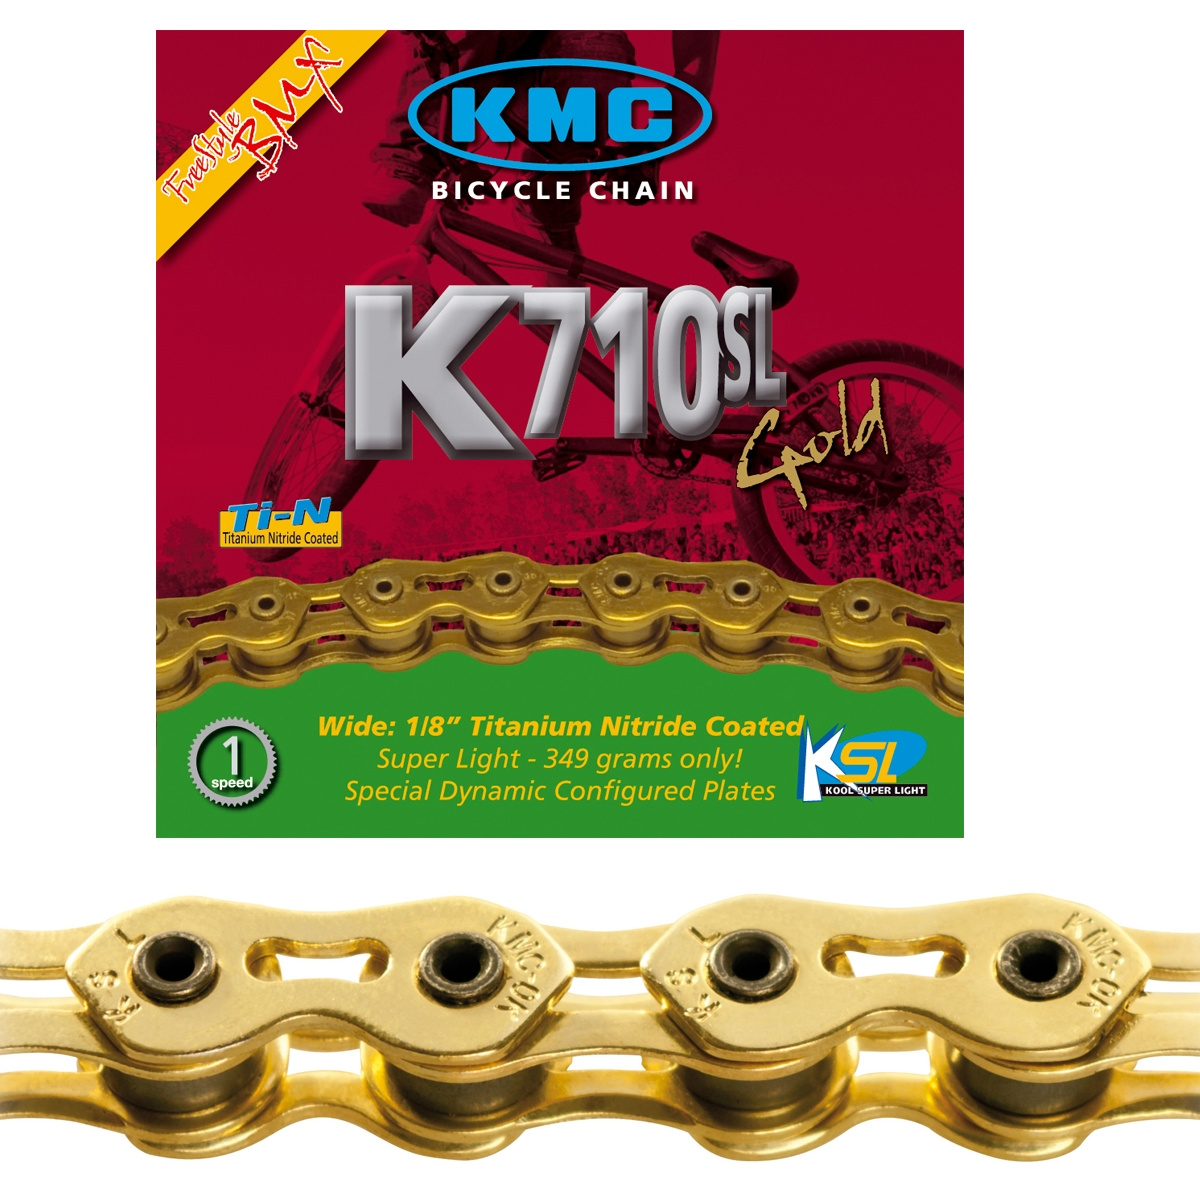 Chaîne vélo KMC BMX K710 Sl Ti-N Or Kool Series 100 maillons